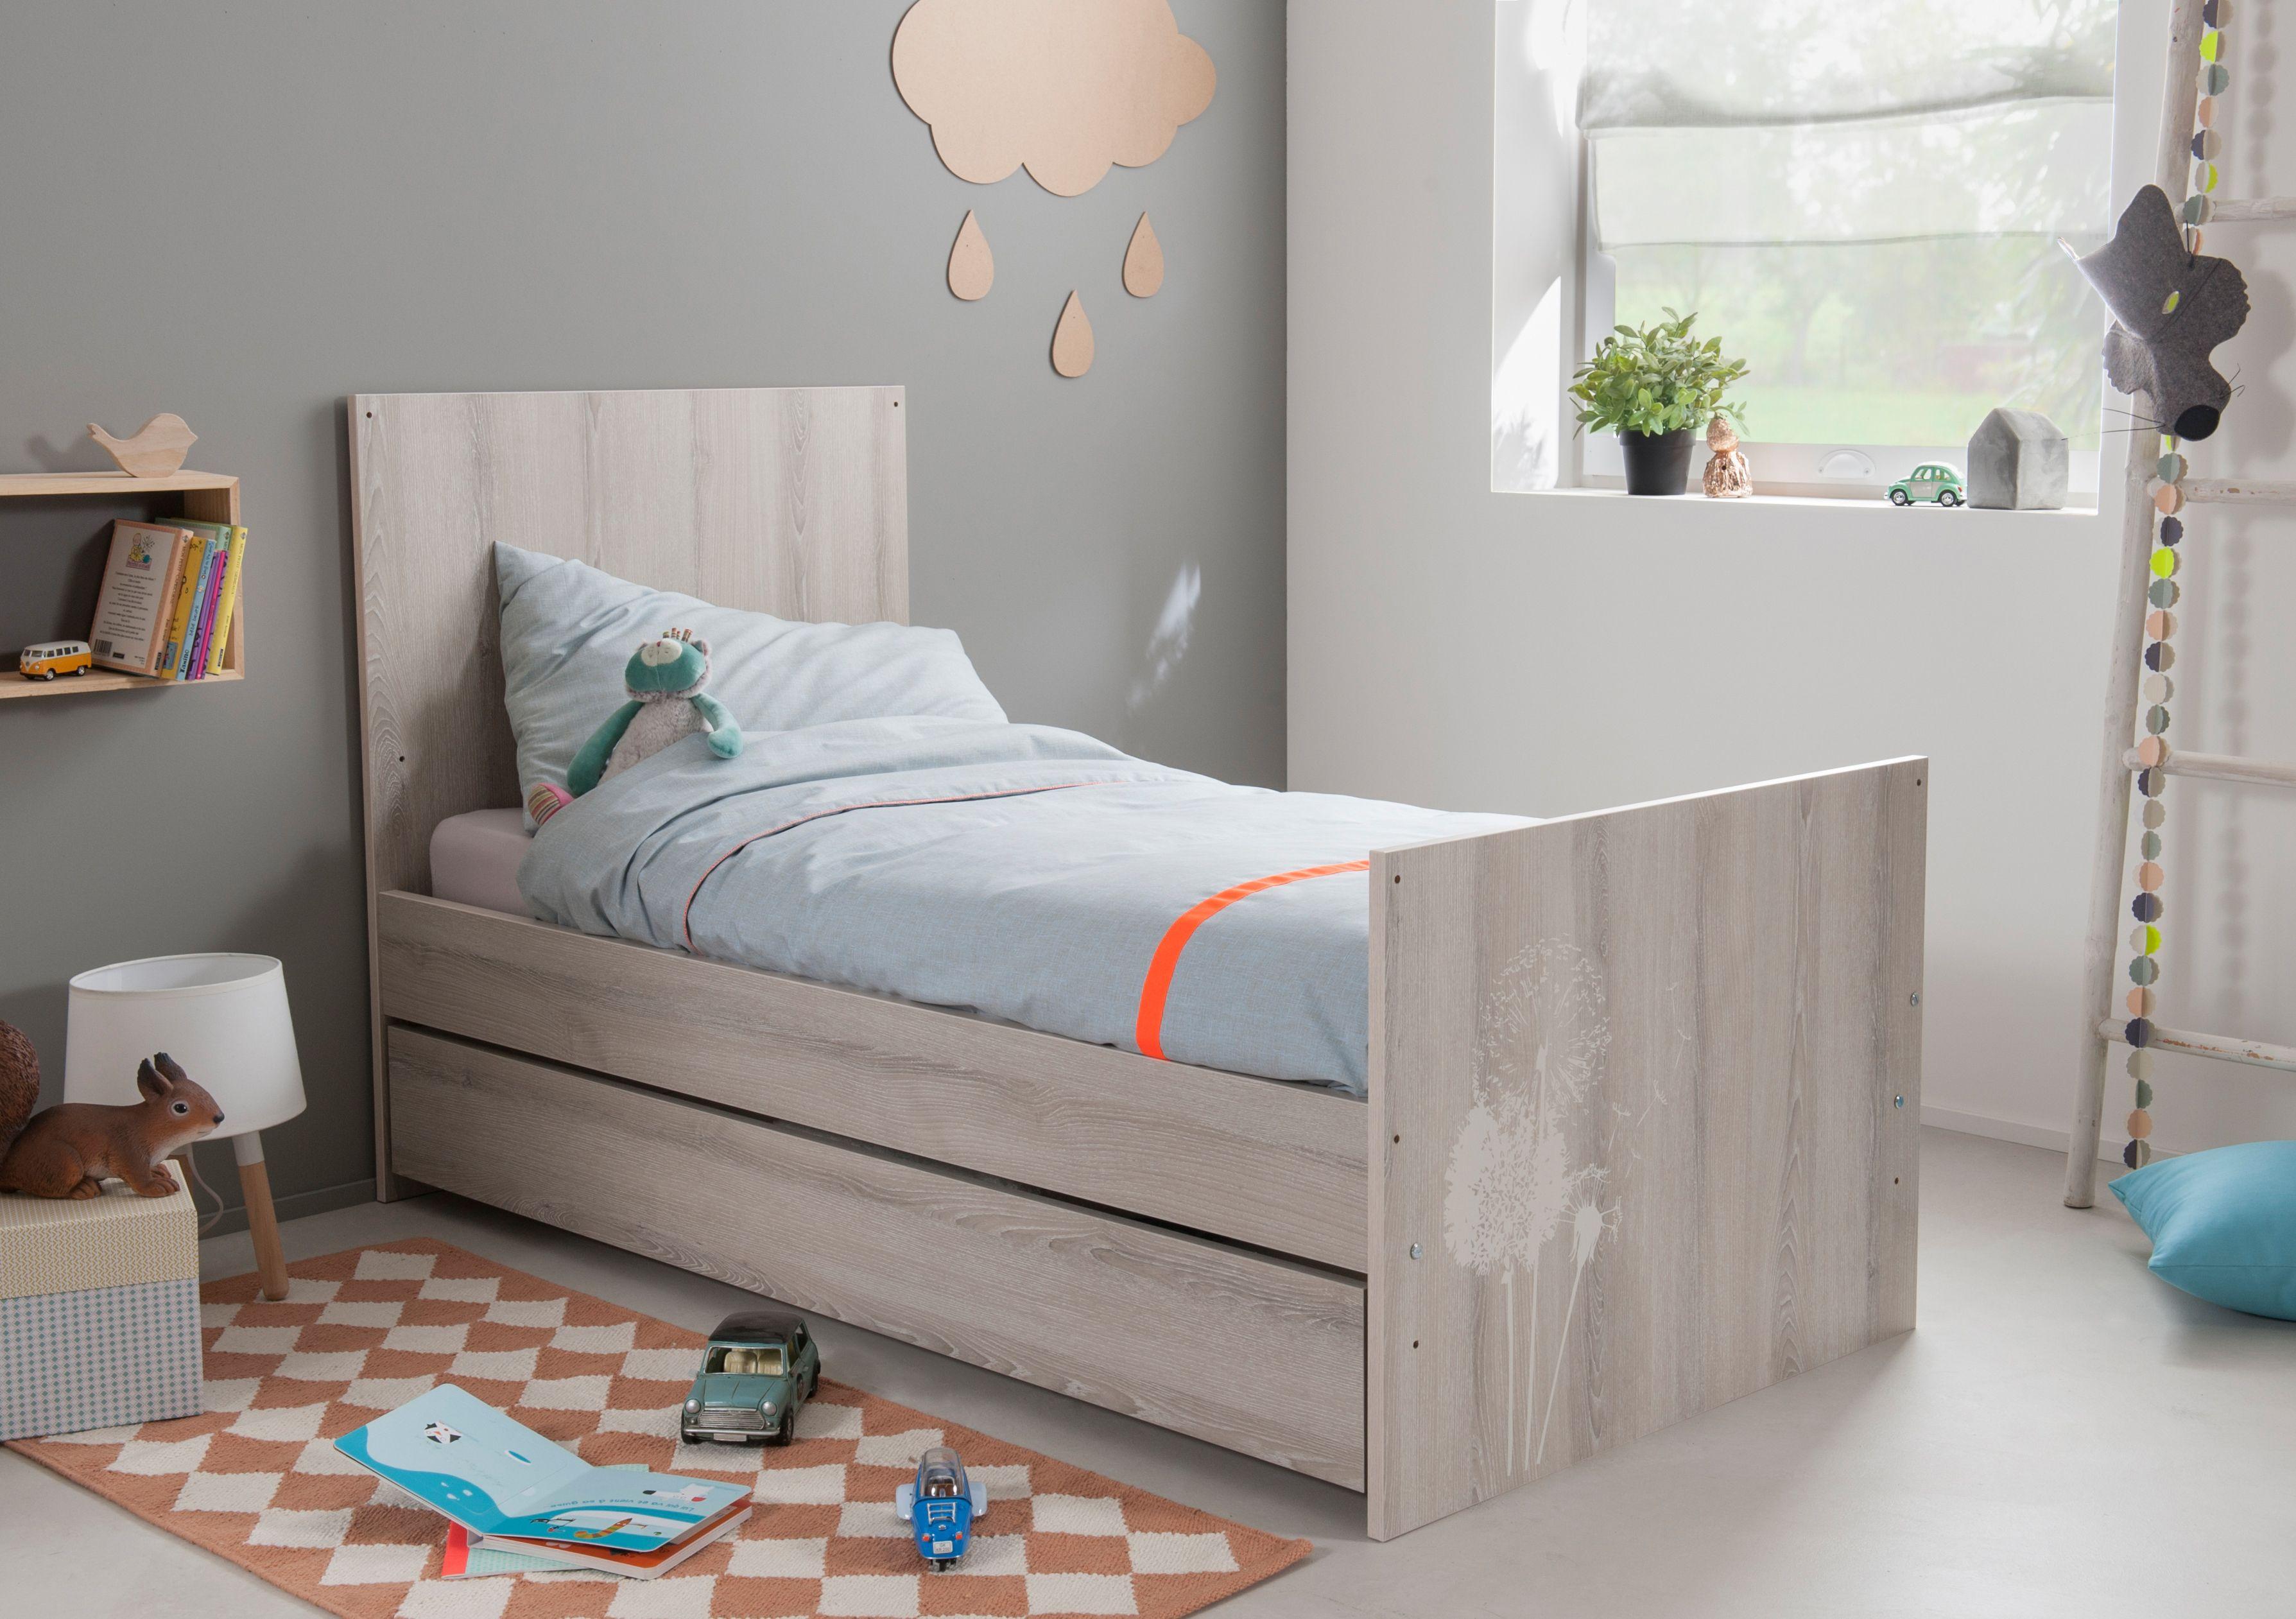 chambre forest lit transformable en lit jeune enfant 70. Black Bedroom Furniture Sets. Home Design Ideas